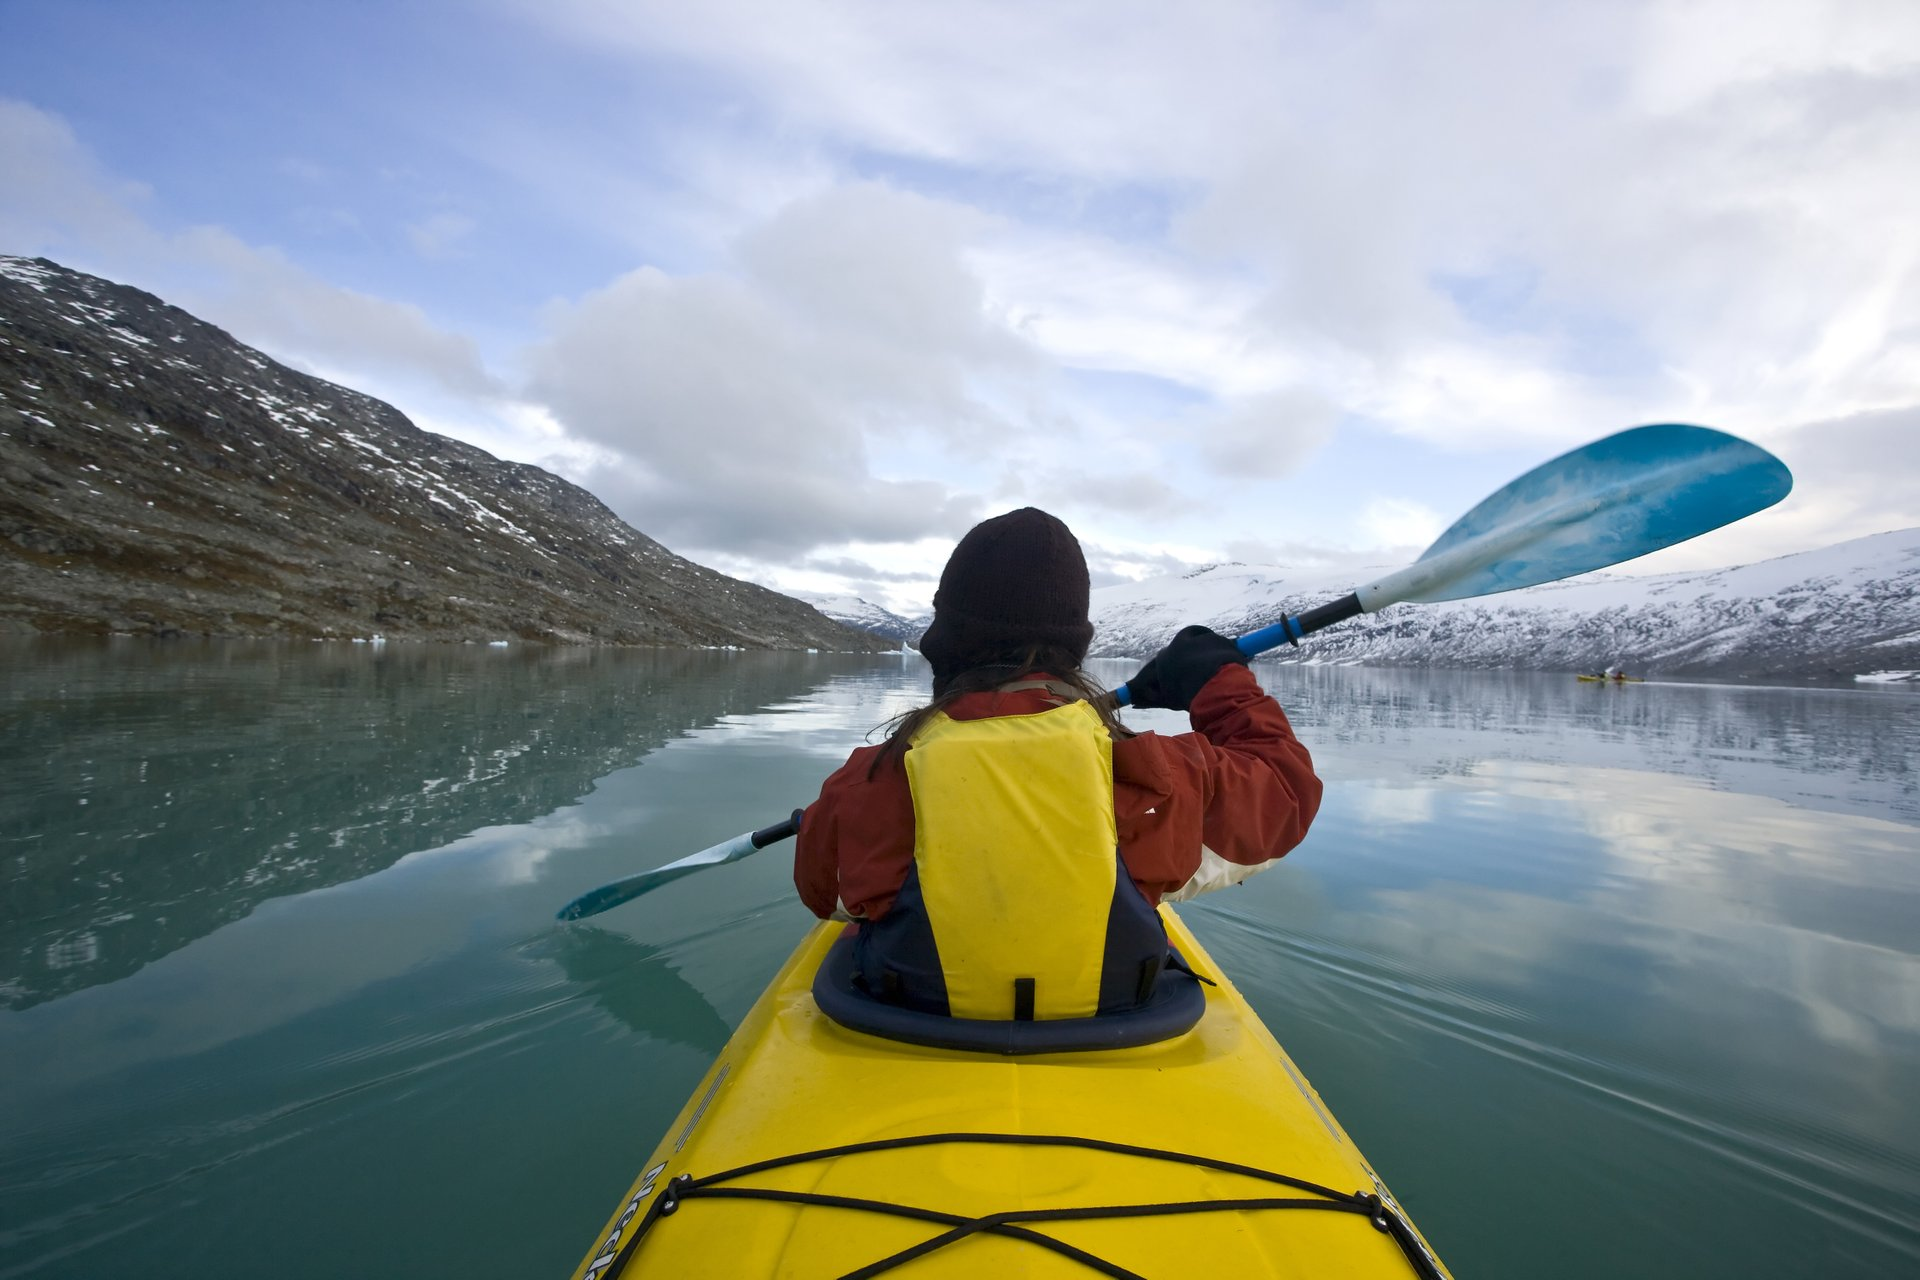 Glacier Lake Kayaking in Norway 2020 - Best Time